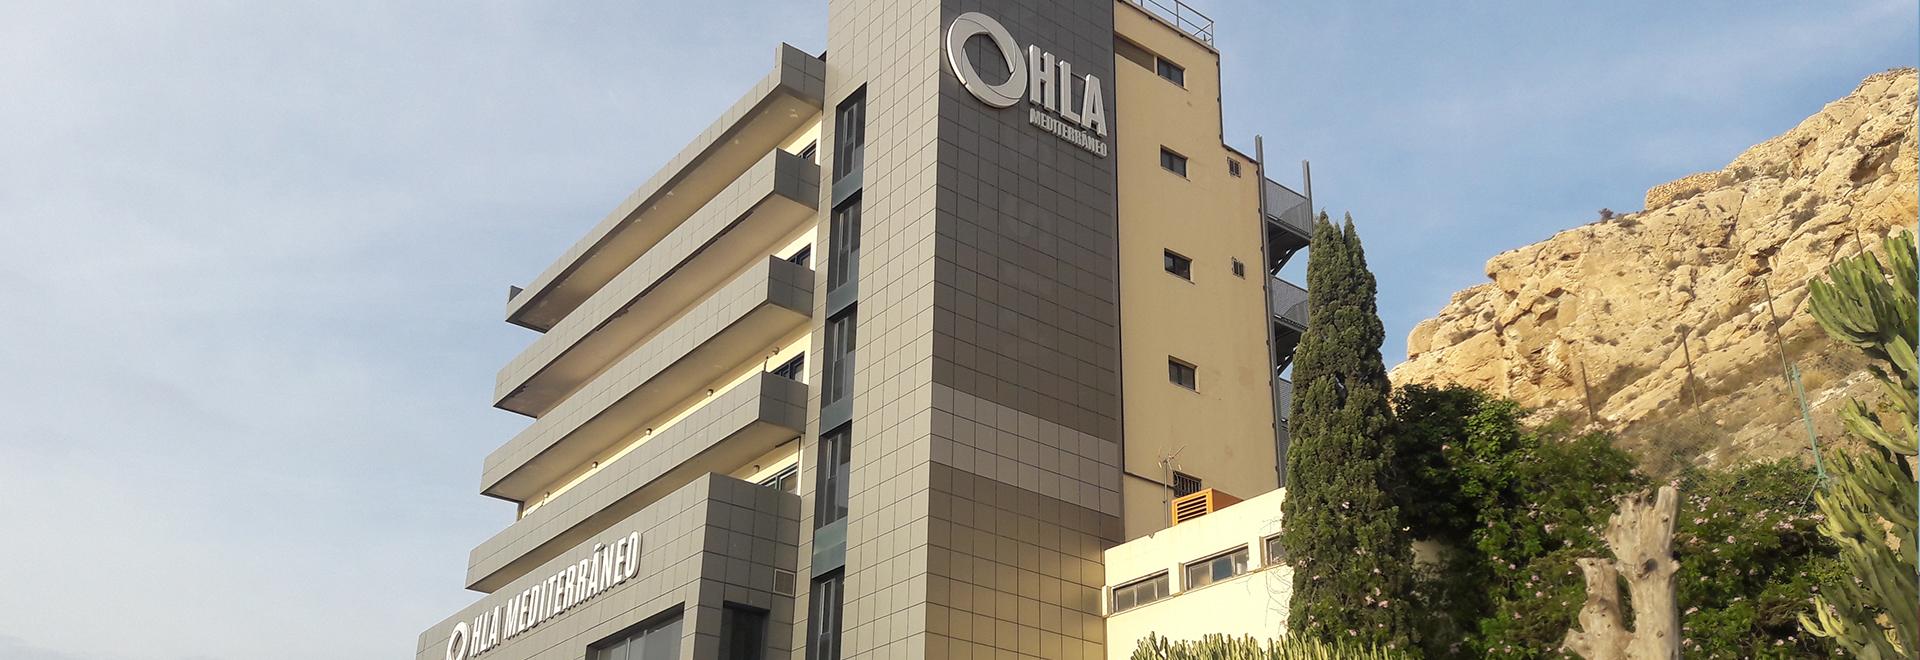 05-hospitales